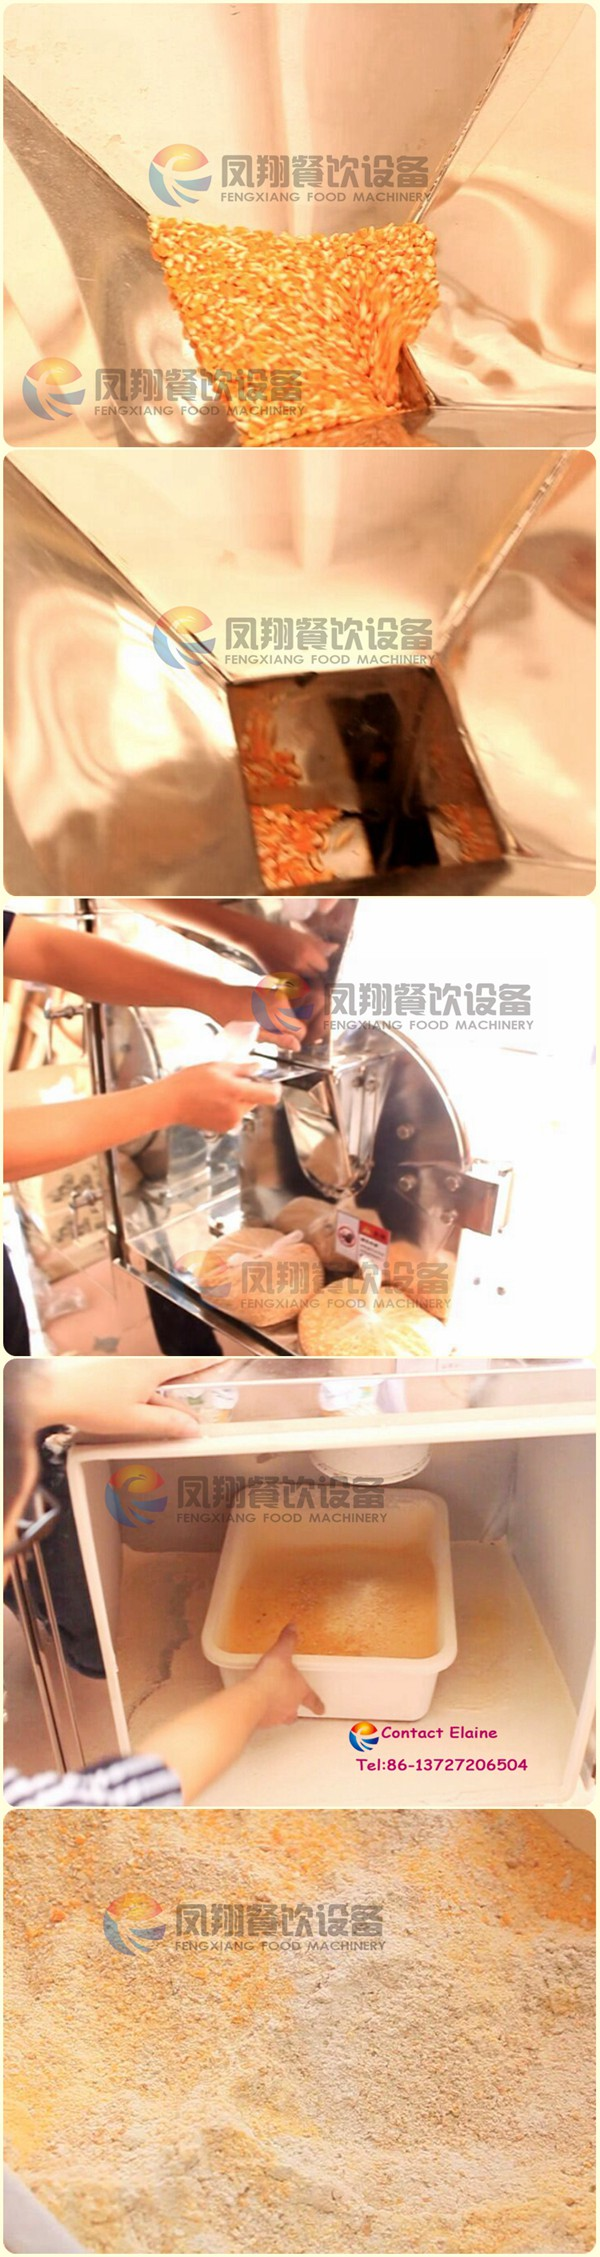 Automatic Corn Maize Rice Flour Milling Grinding Machine